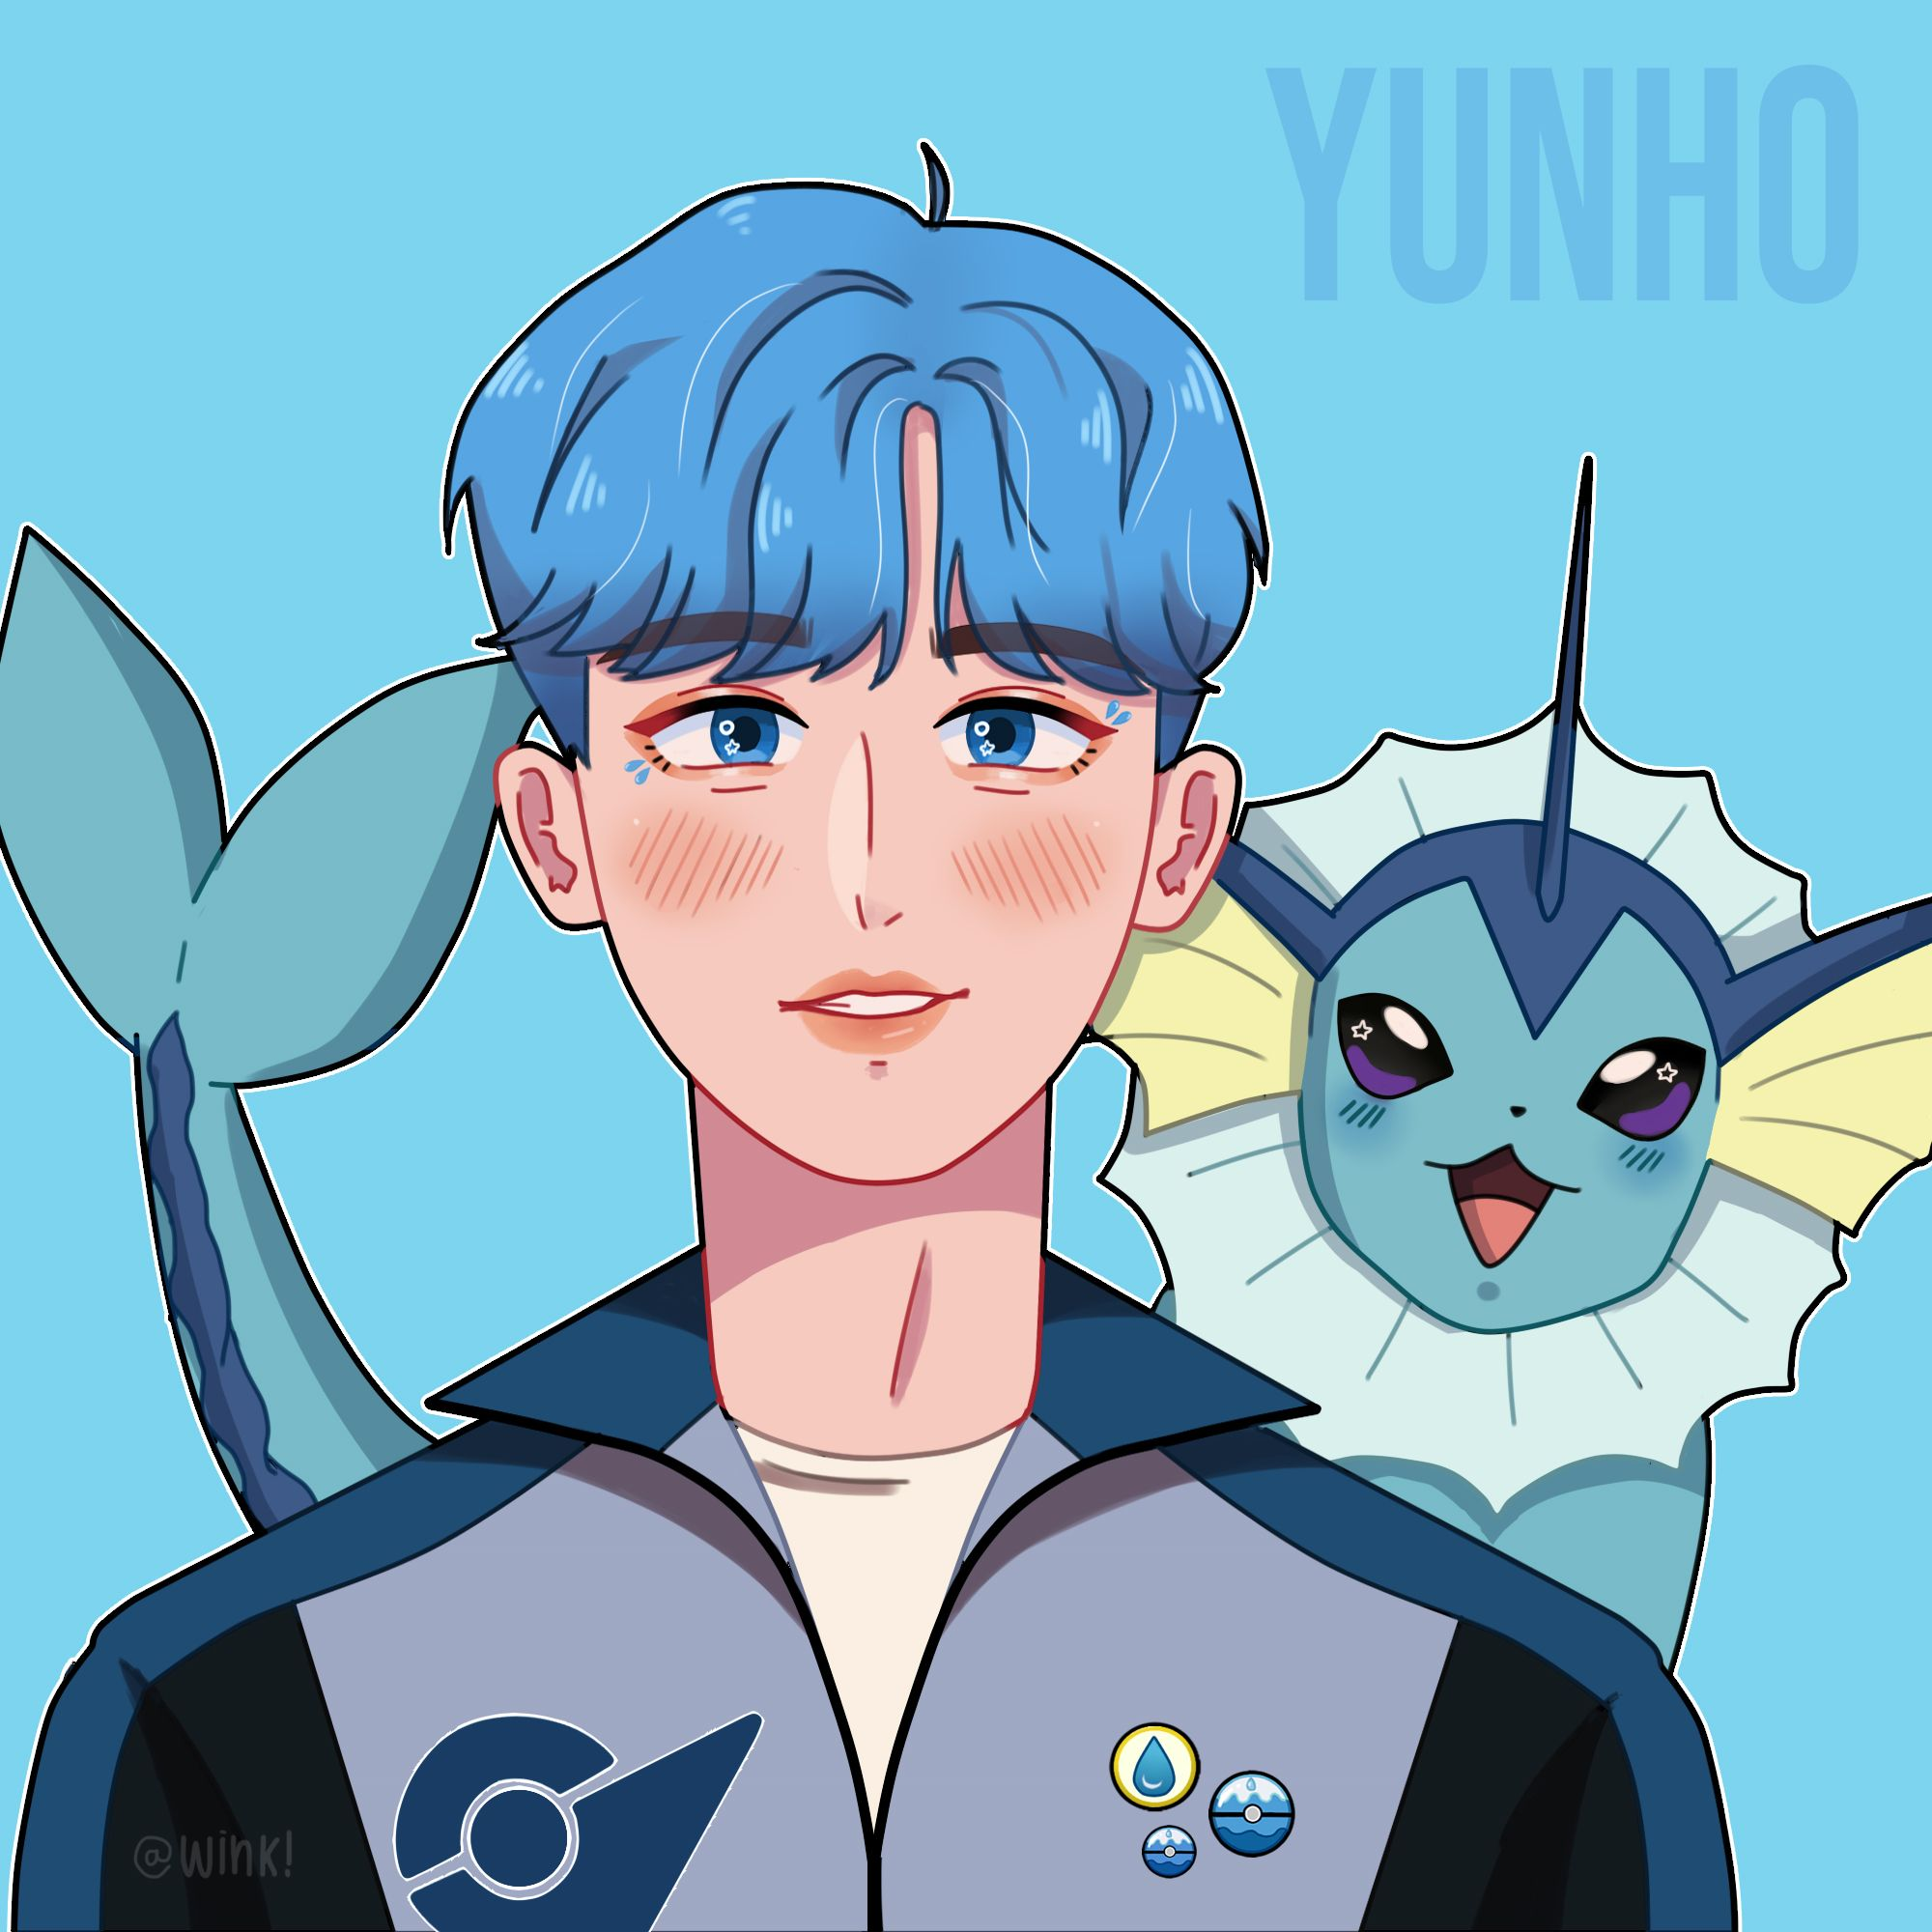 𝒘𝒊𝒏𝒌! 🎉 happy yunho day 🎉 on in 2020 Kpop drawings, Kpop